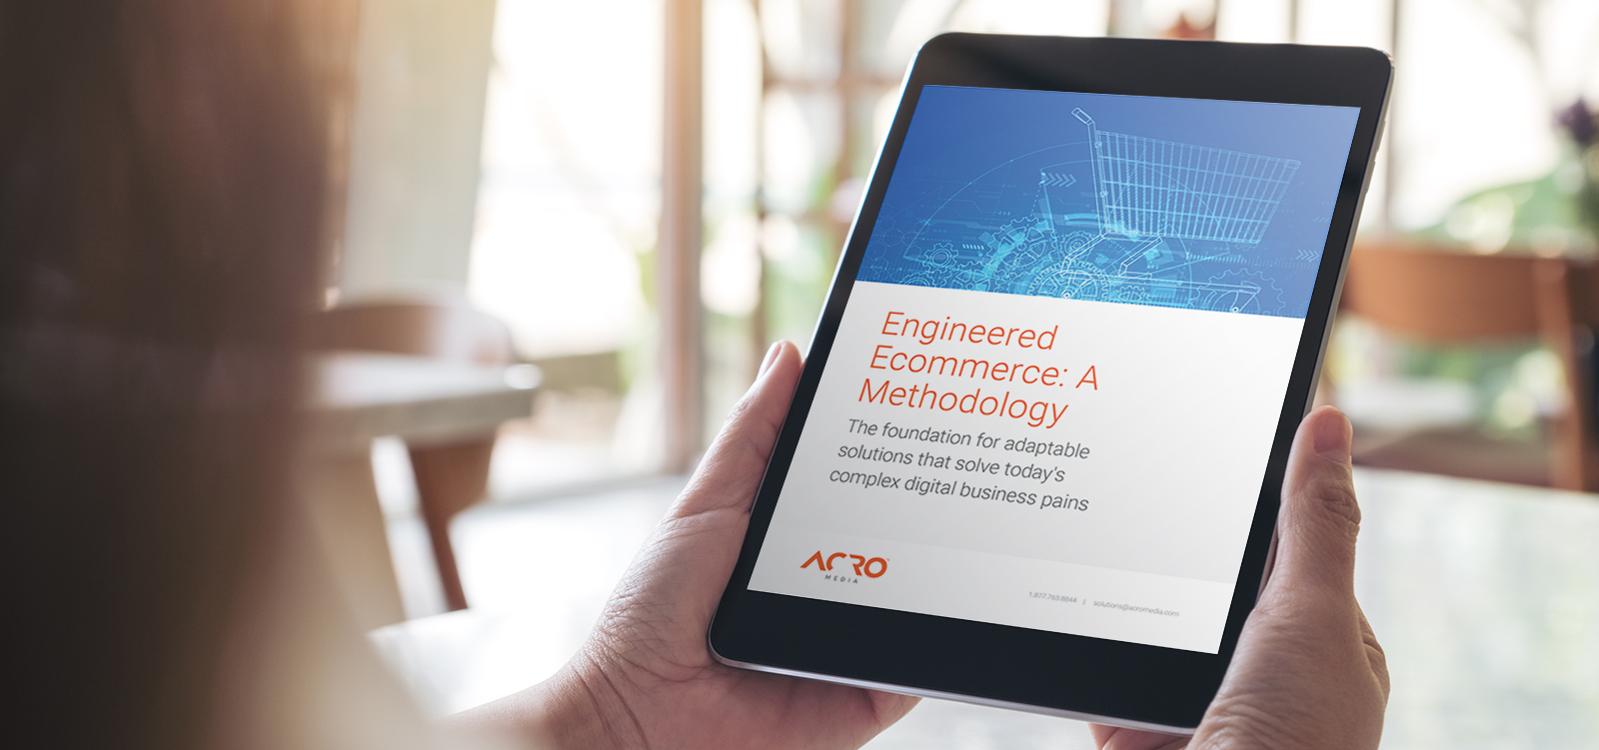 Engineered ecommerce: A digital transformation methodology | Acro Media